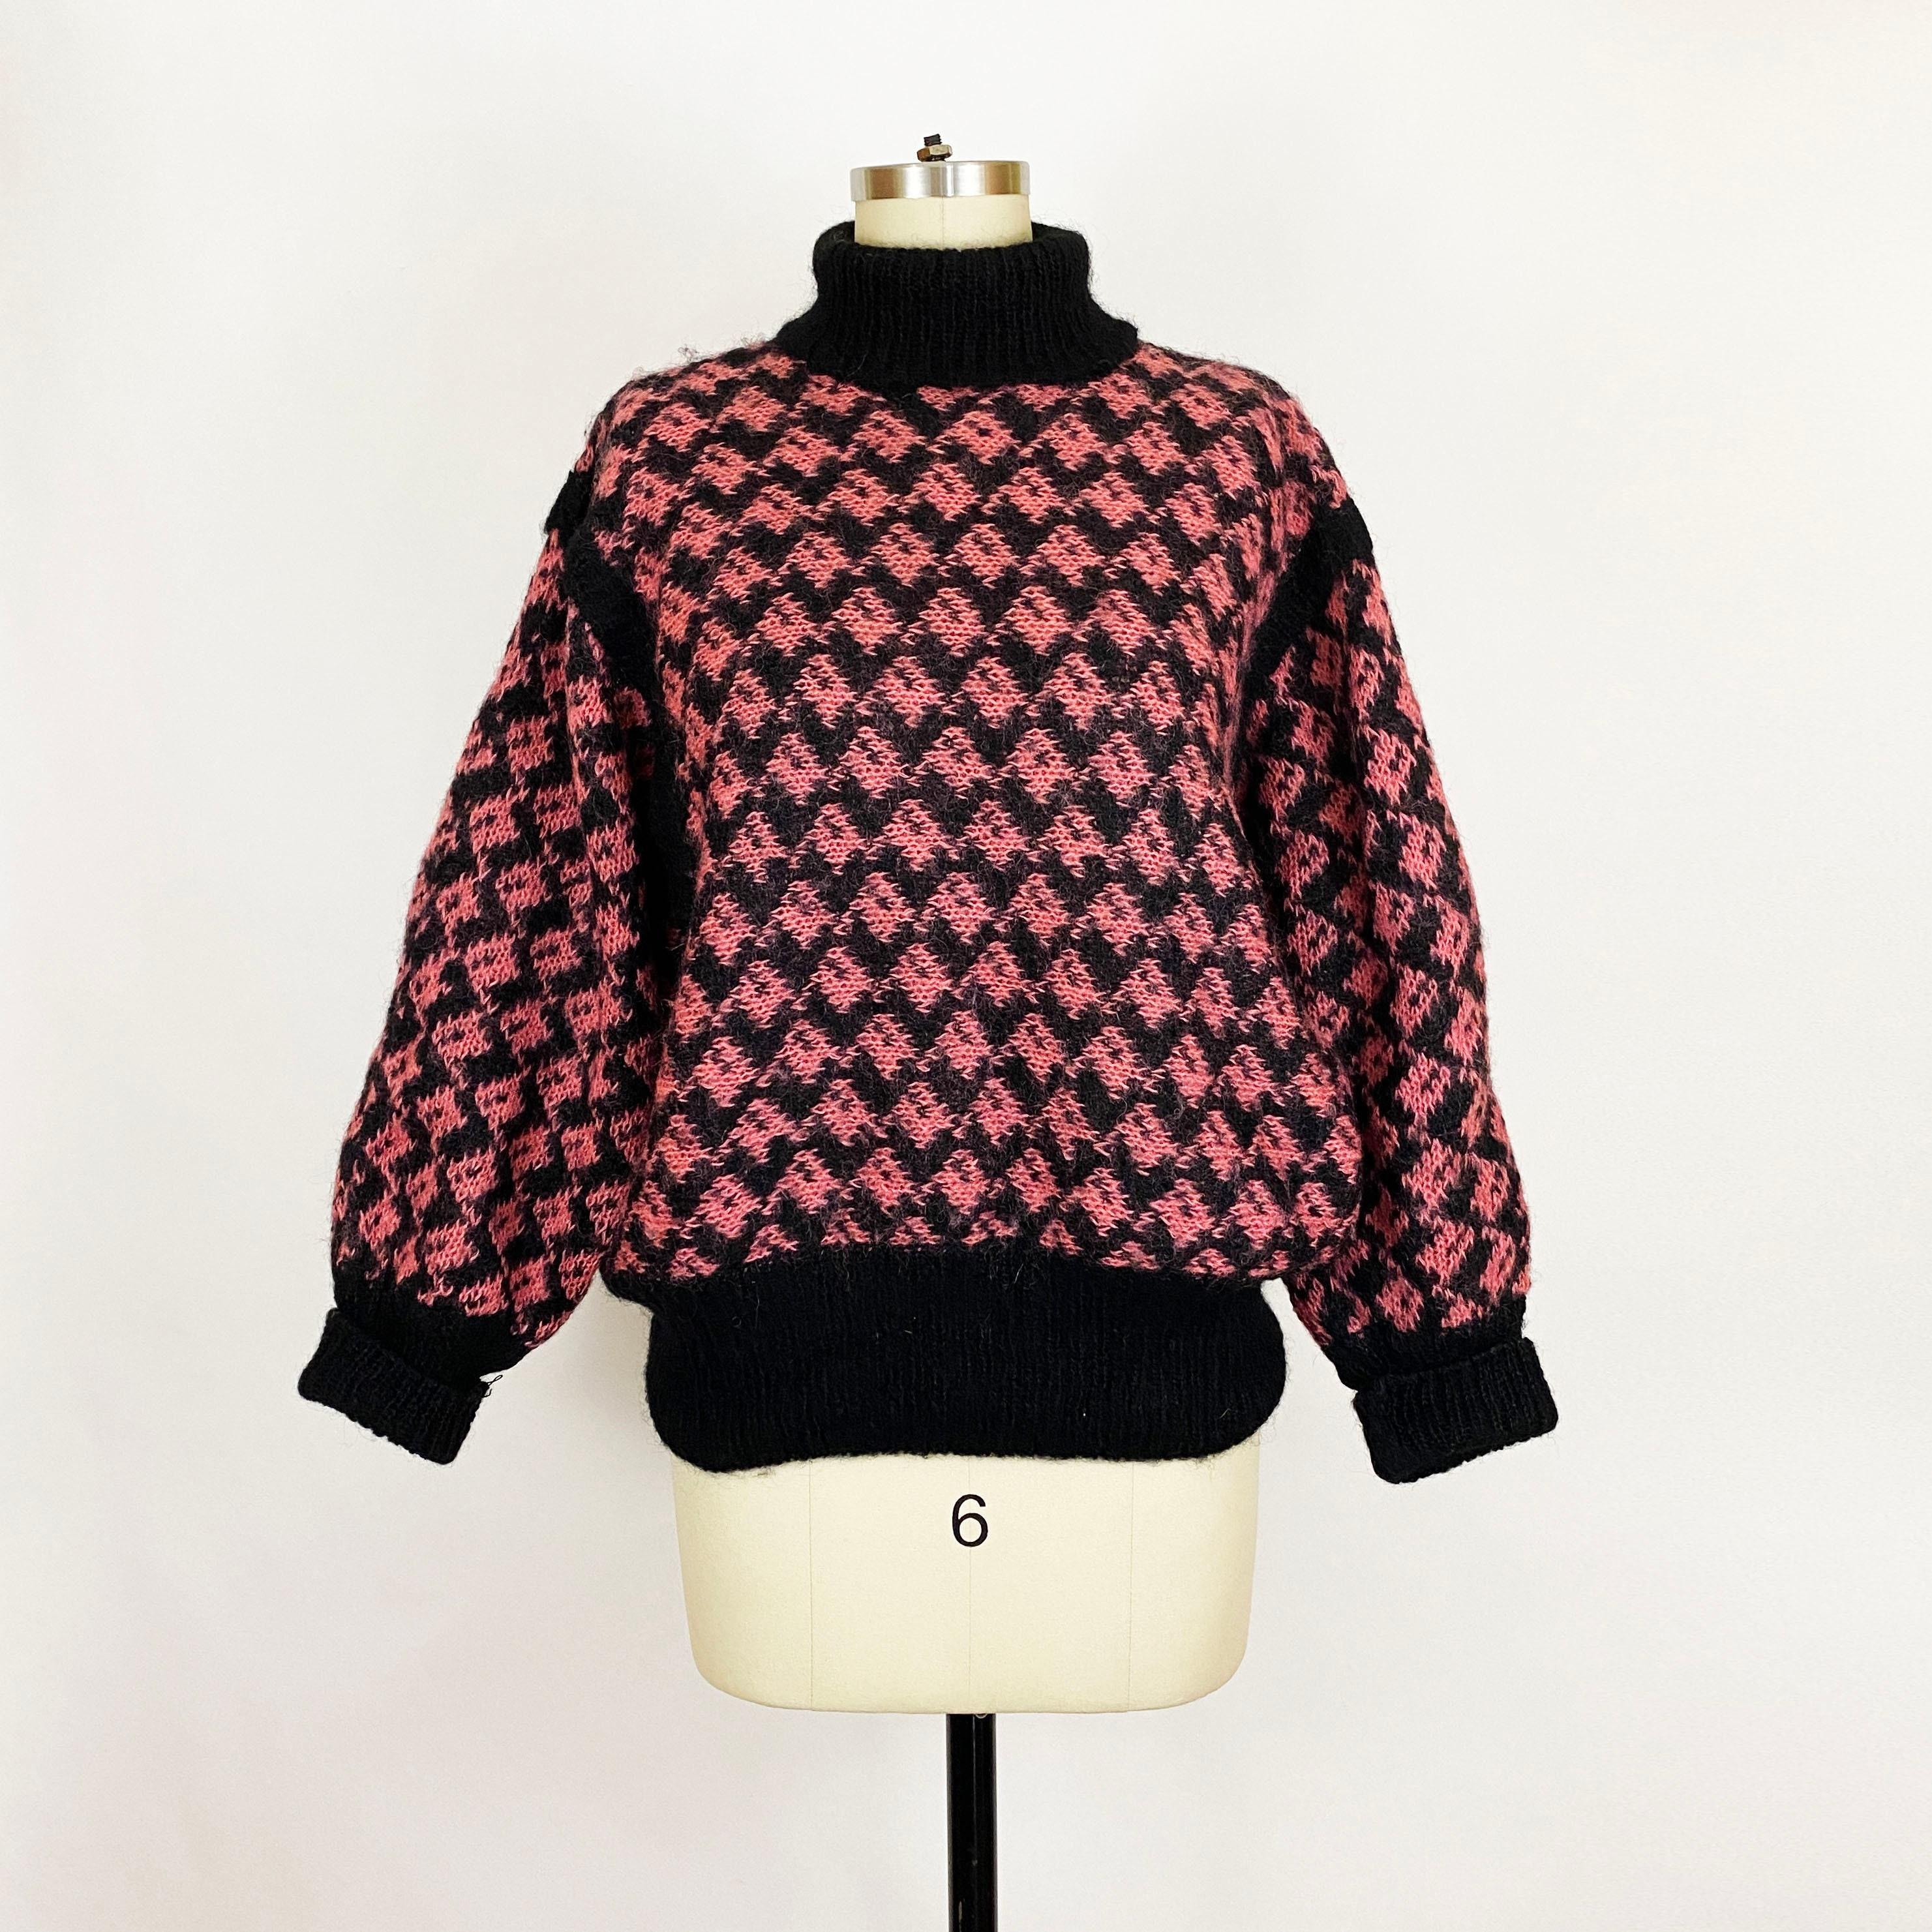 80s Sweatshirts, Sweaters, Vests | Women 1980S Black Pink Geometric Mohair Wool Turtleneck Pullover Dolman Sweater Cute 80S 90S Vintage JumperMontana Hamburg Oversized Large $50.00 AT vintagedancer.com